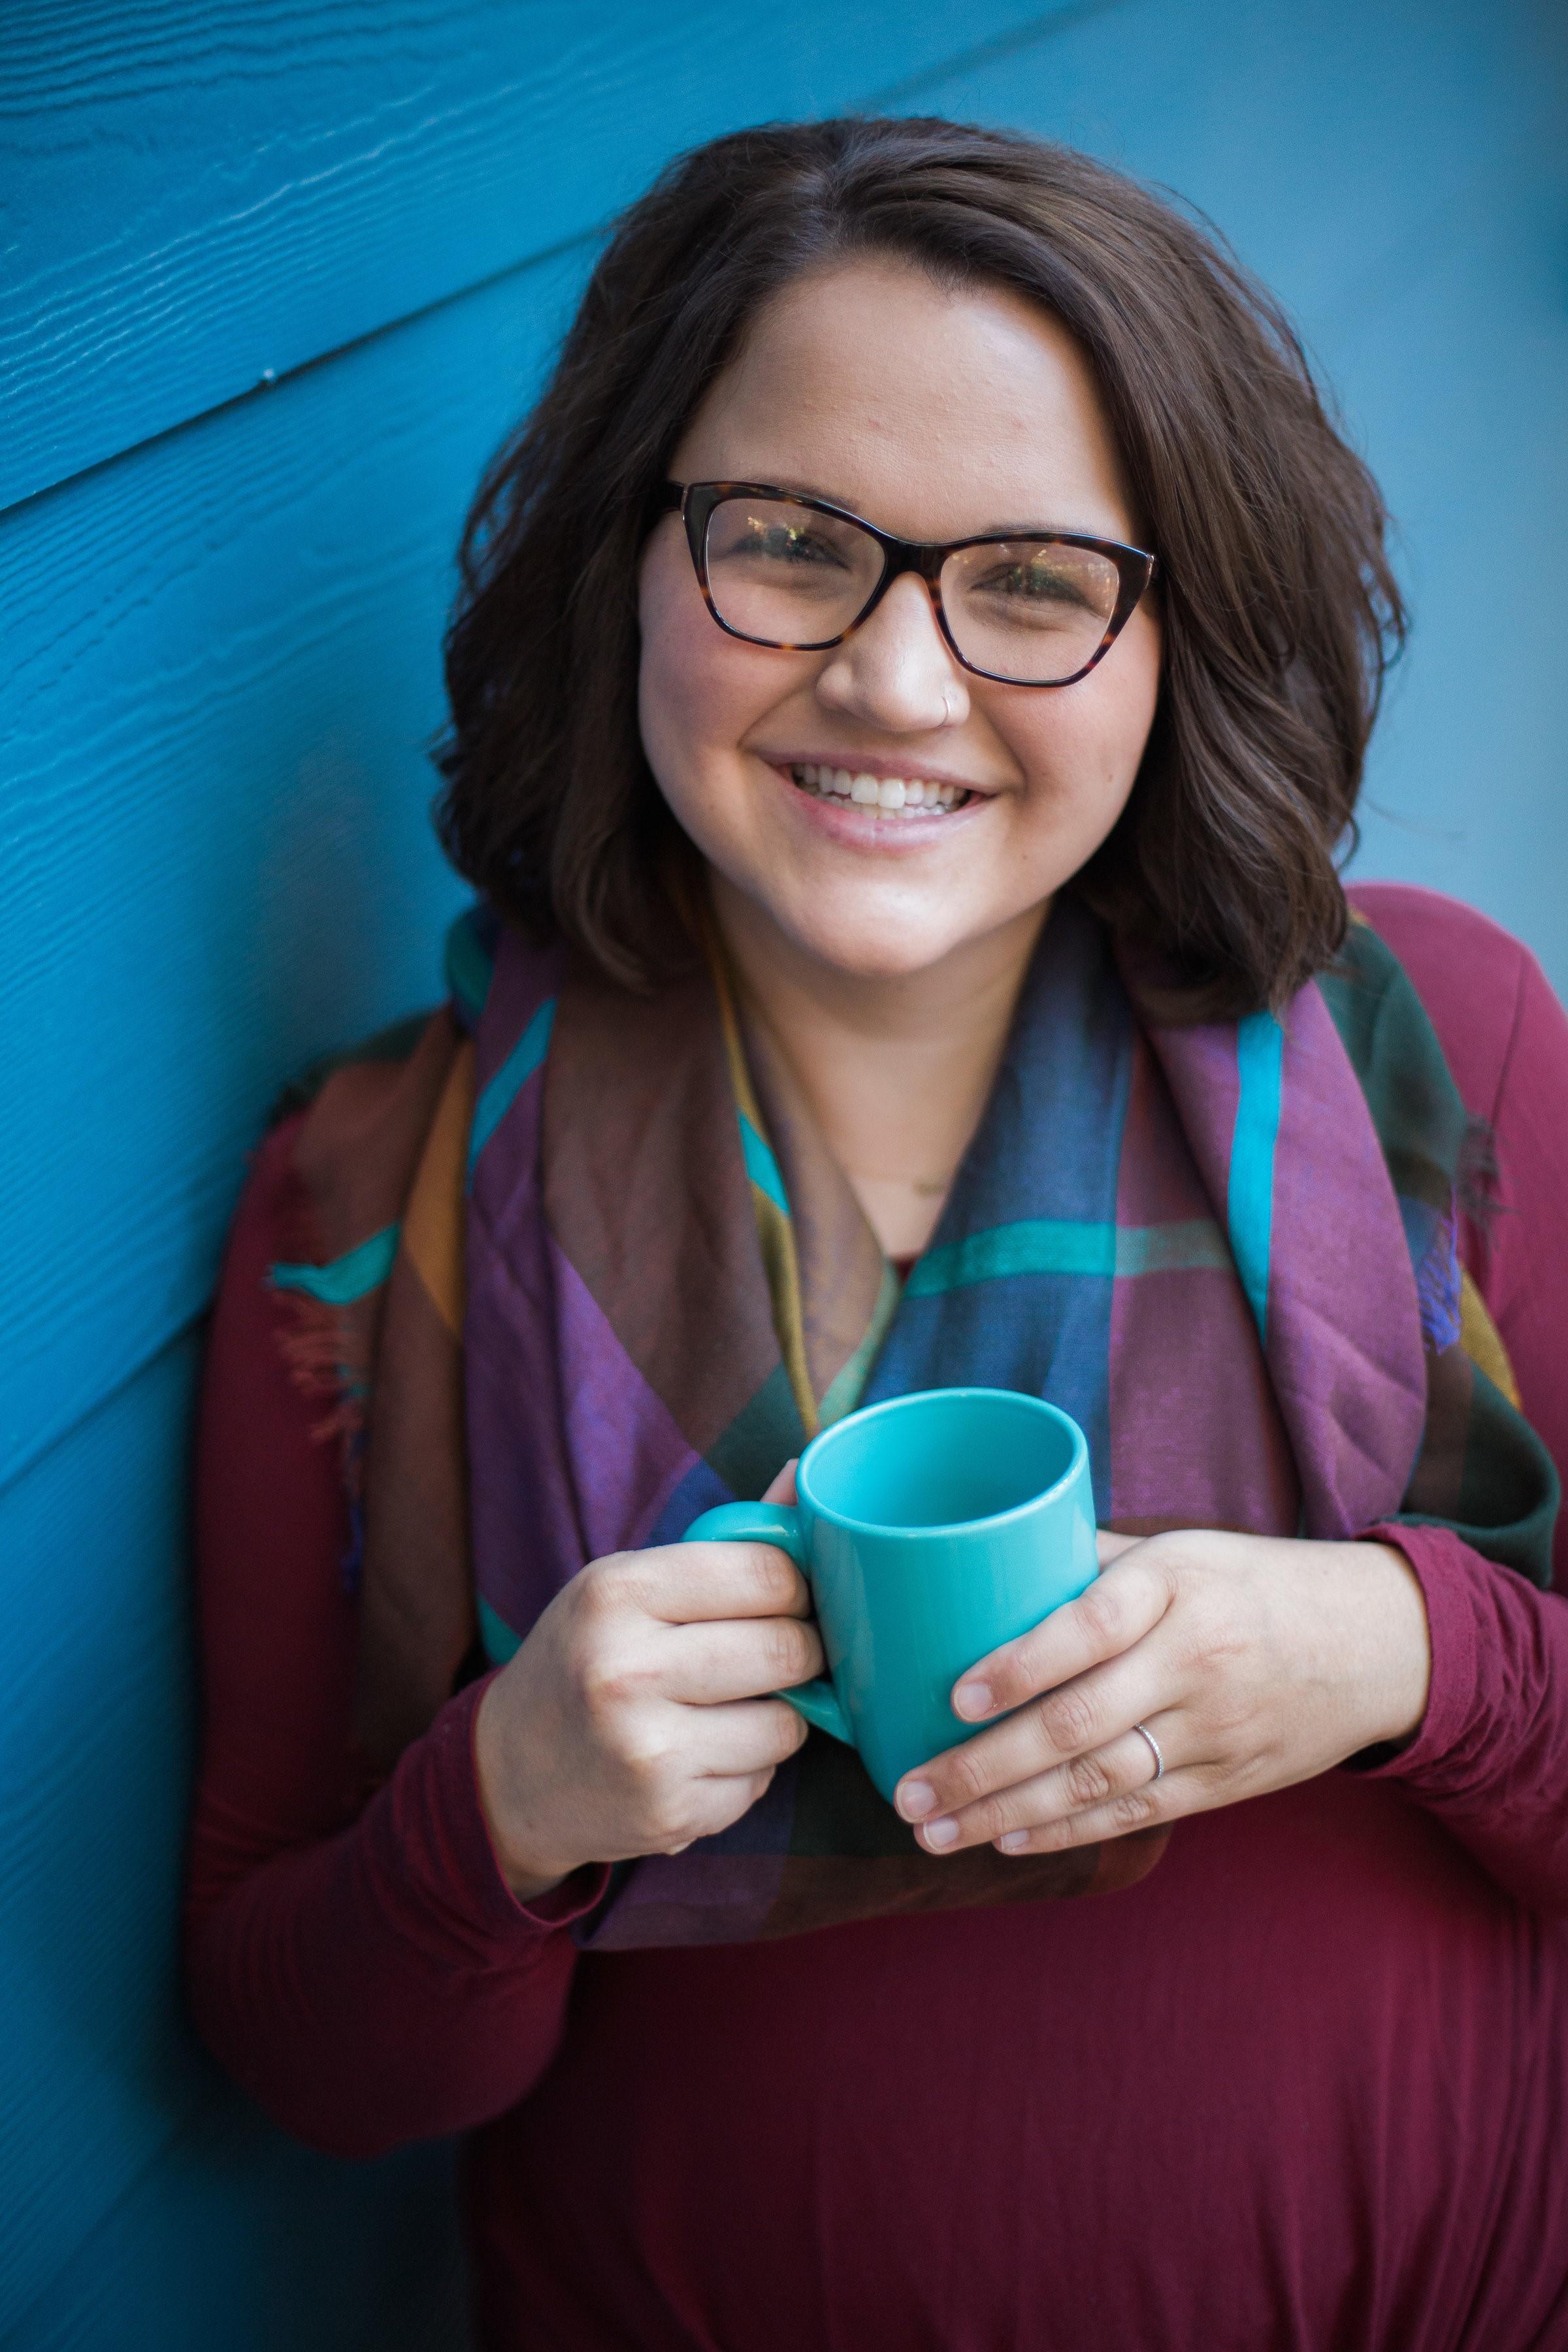 Glasses Abby elizabeth winters